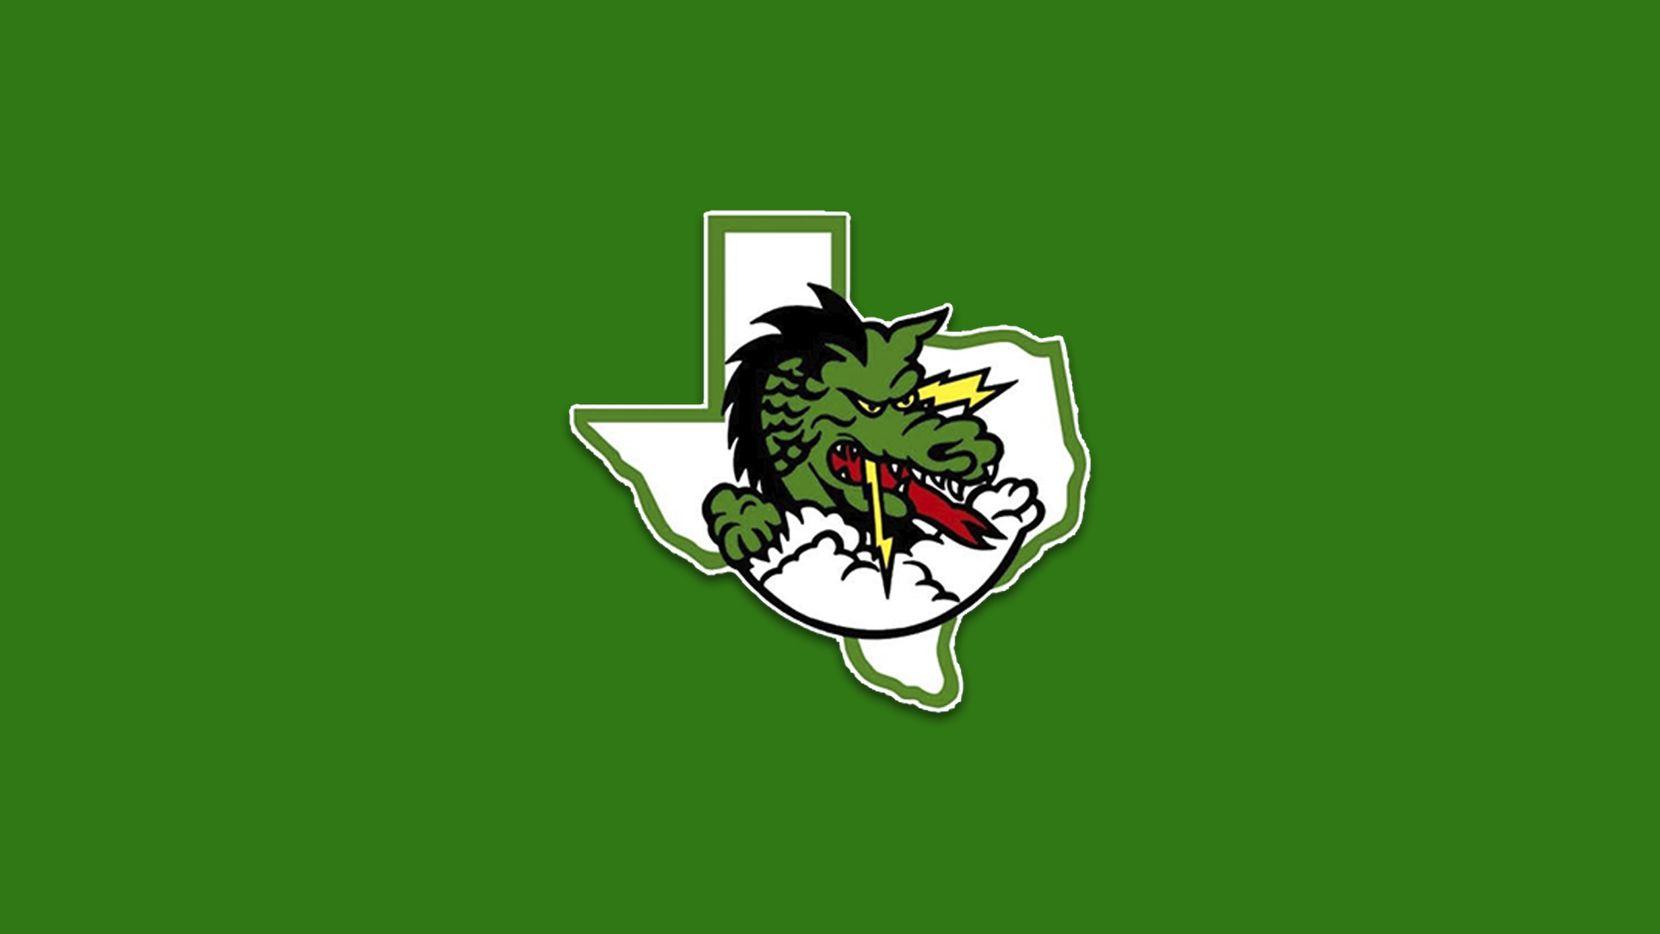 Southlake Carroll logo.